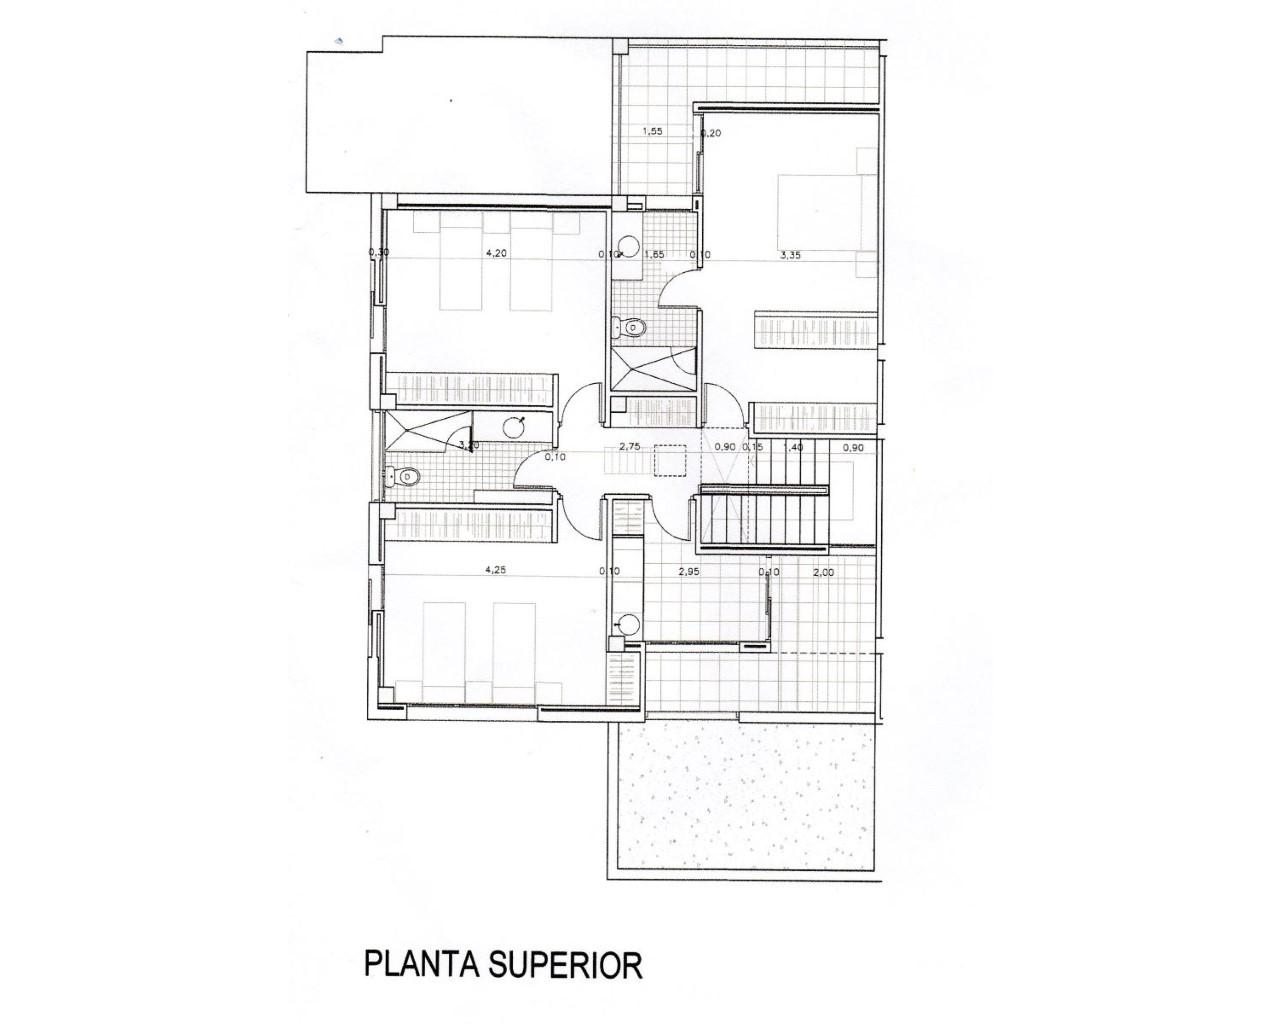 V2181(2) distribución planta superior